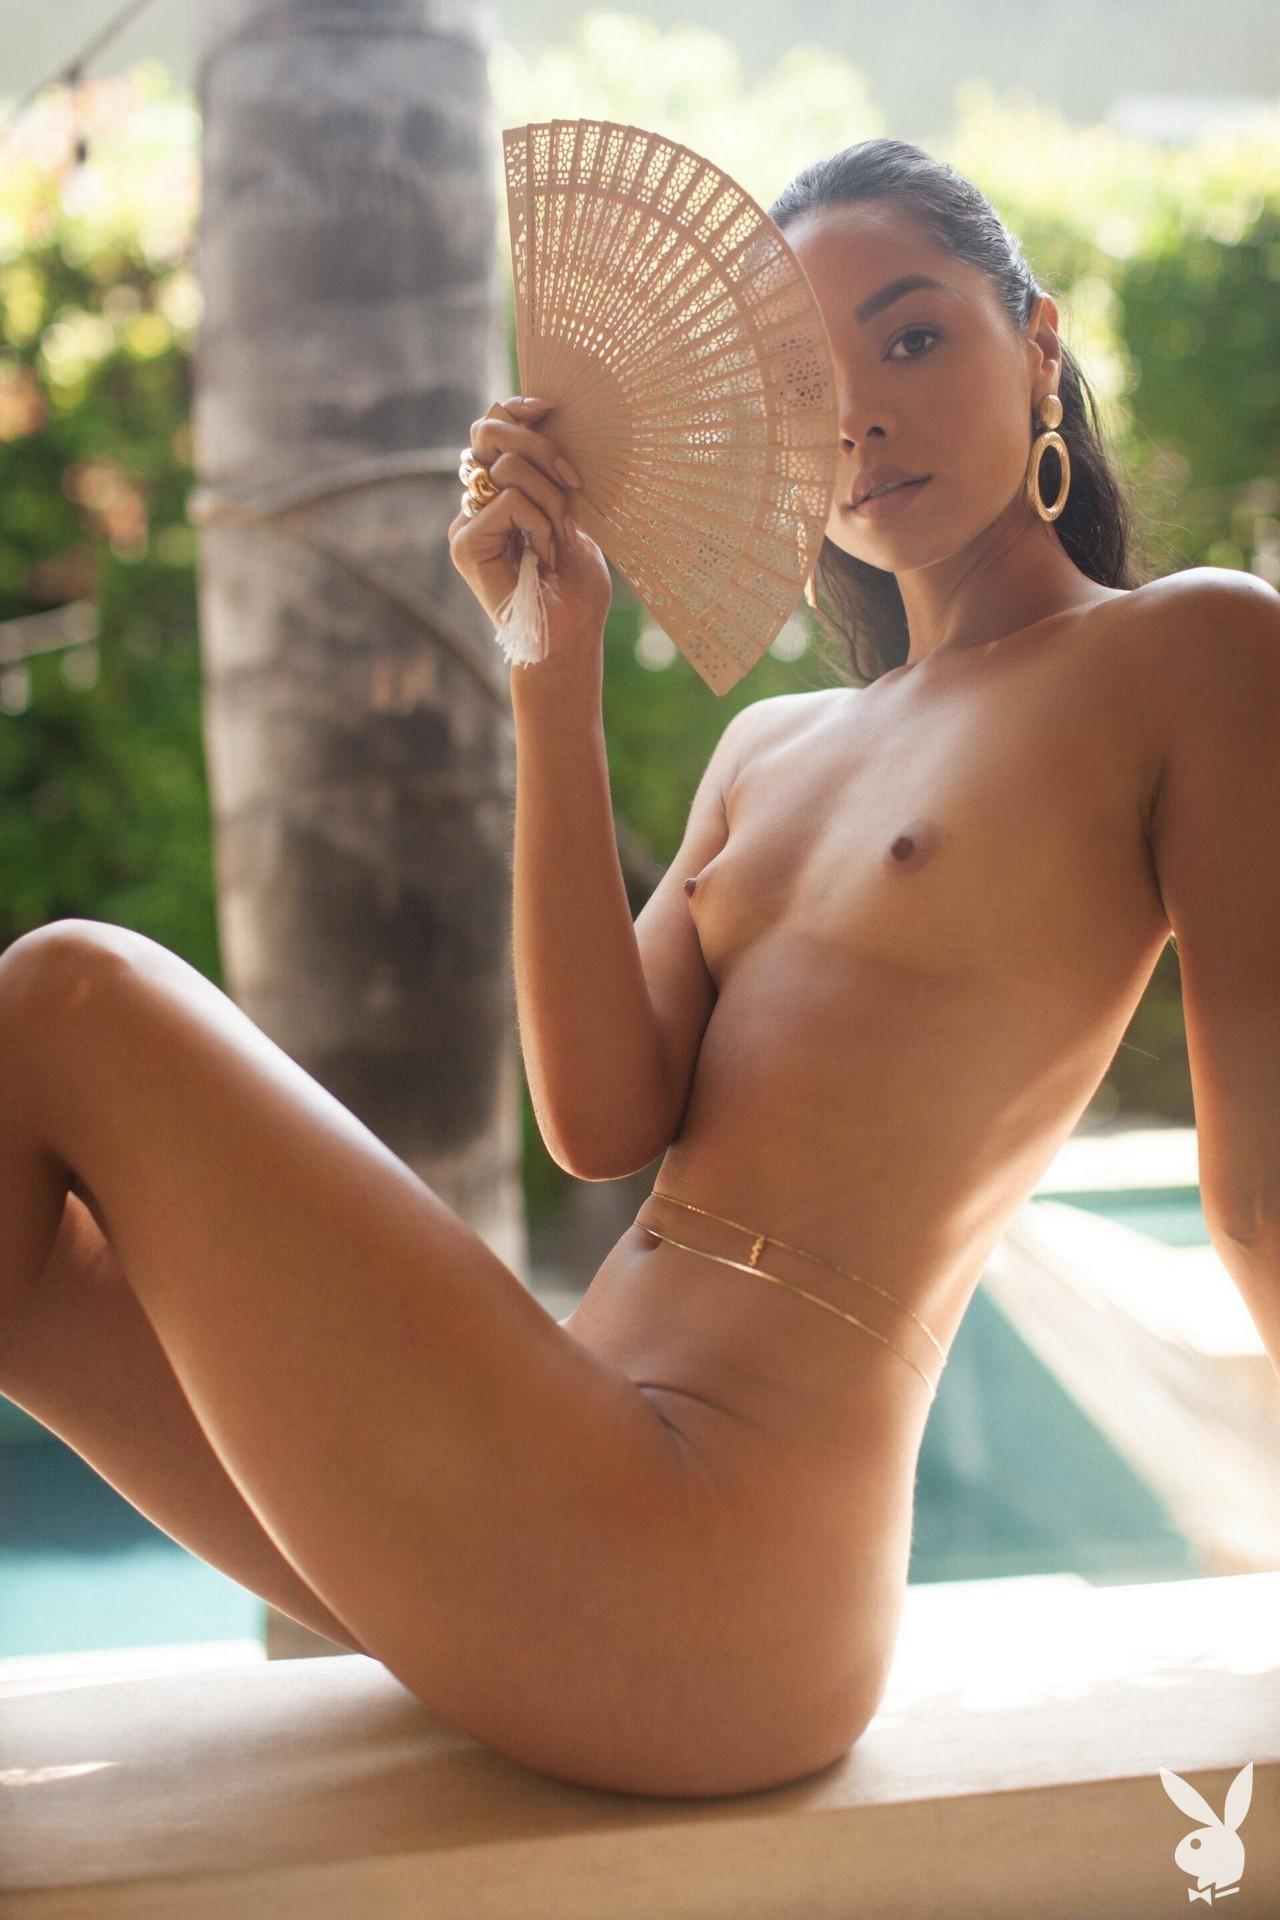 Playmate September 2020 Danielle Alcaraz Playboy Plus (20)